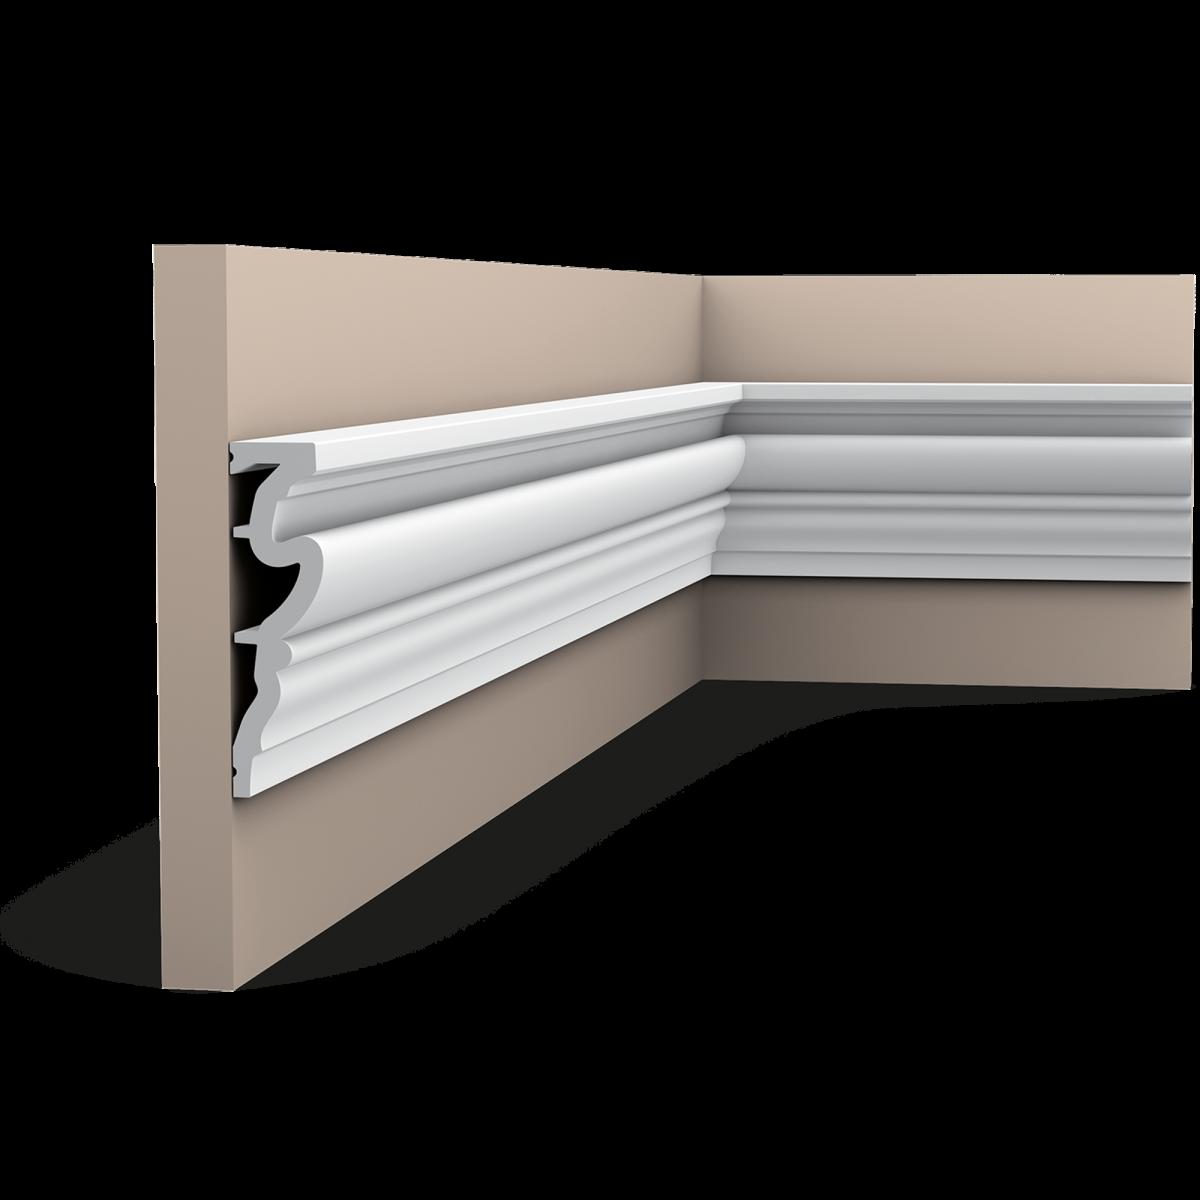 Plintă / Ancadrament Usa Luxxus DX170-2300, Dimensiuni: 230 X 11.9 X 3.2 cm, Orac Decor